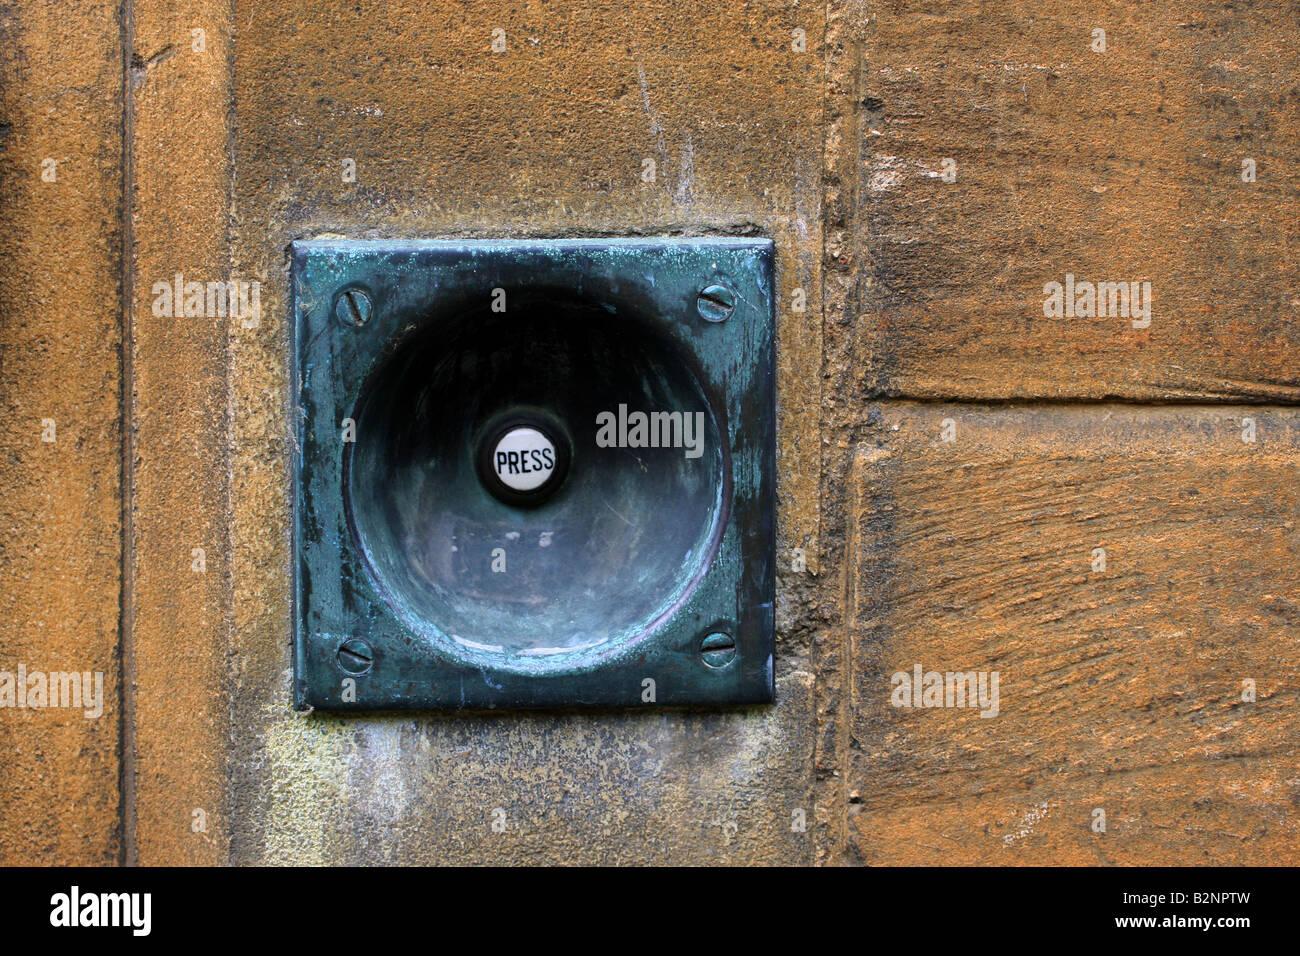 Old door bell in University College, Oxford, Oxfordshire, UK - Stock Image